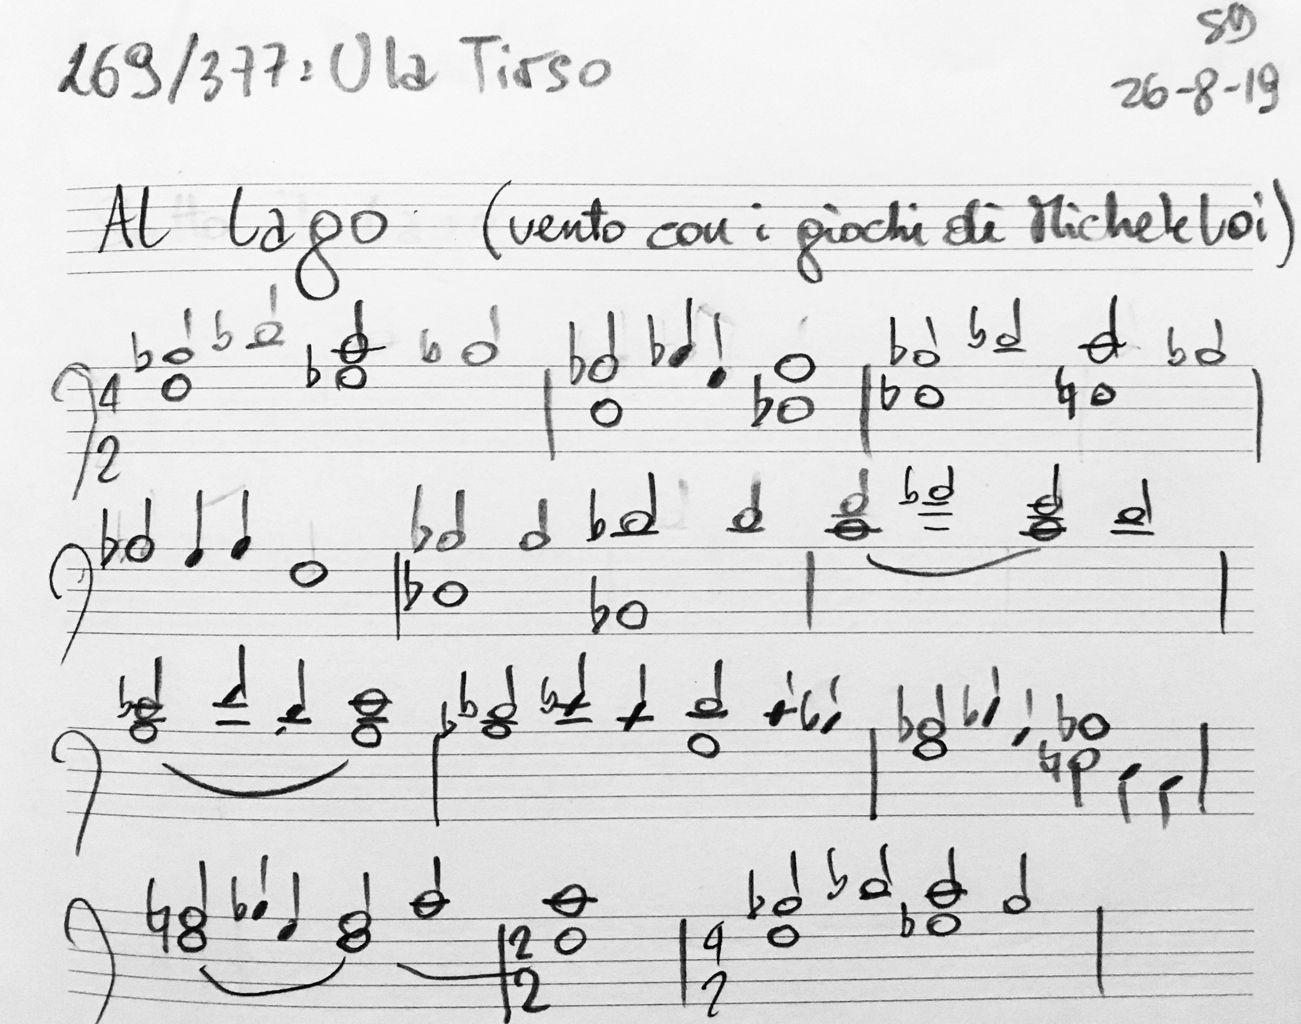 269-Ula-Tirso-score